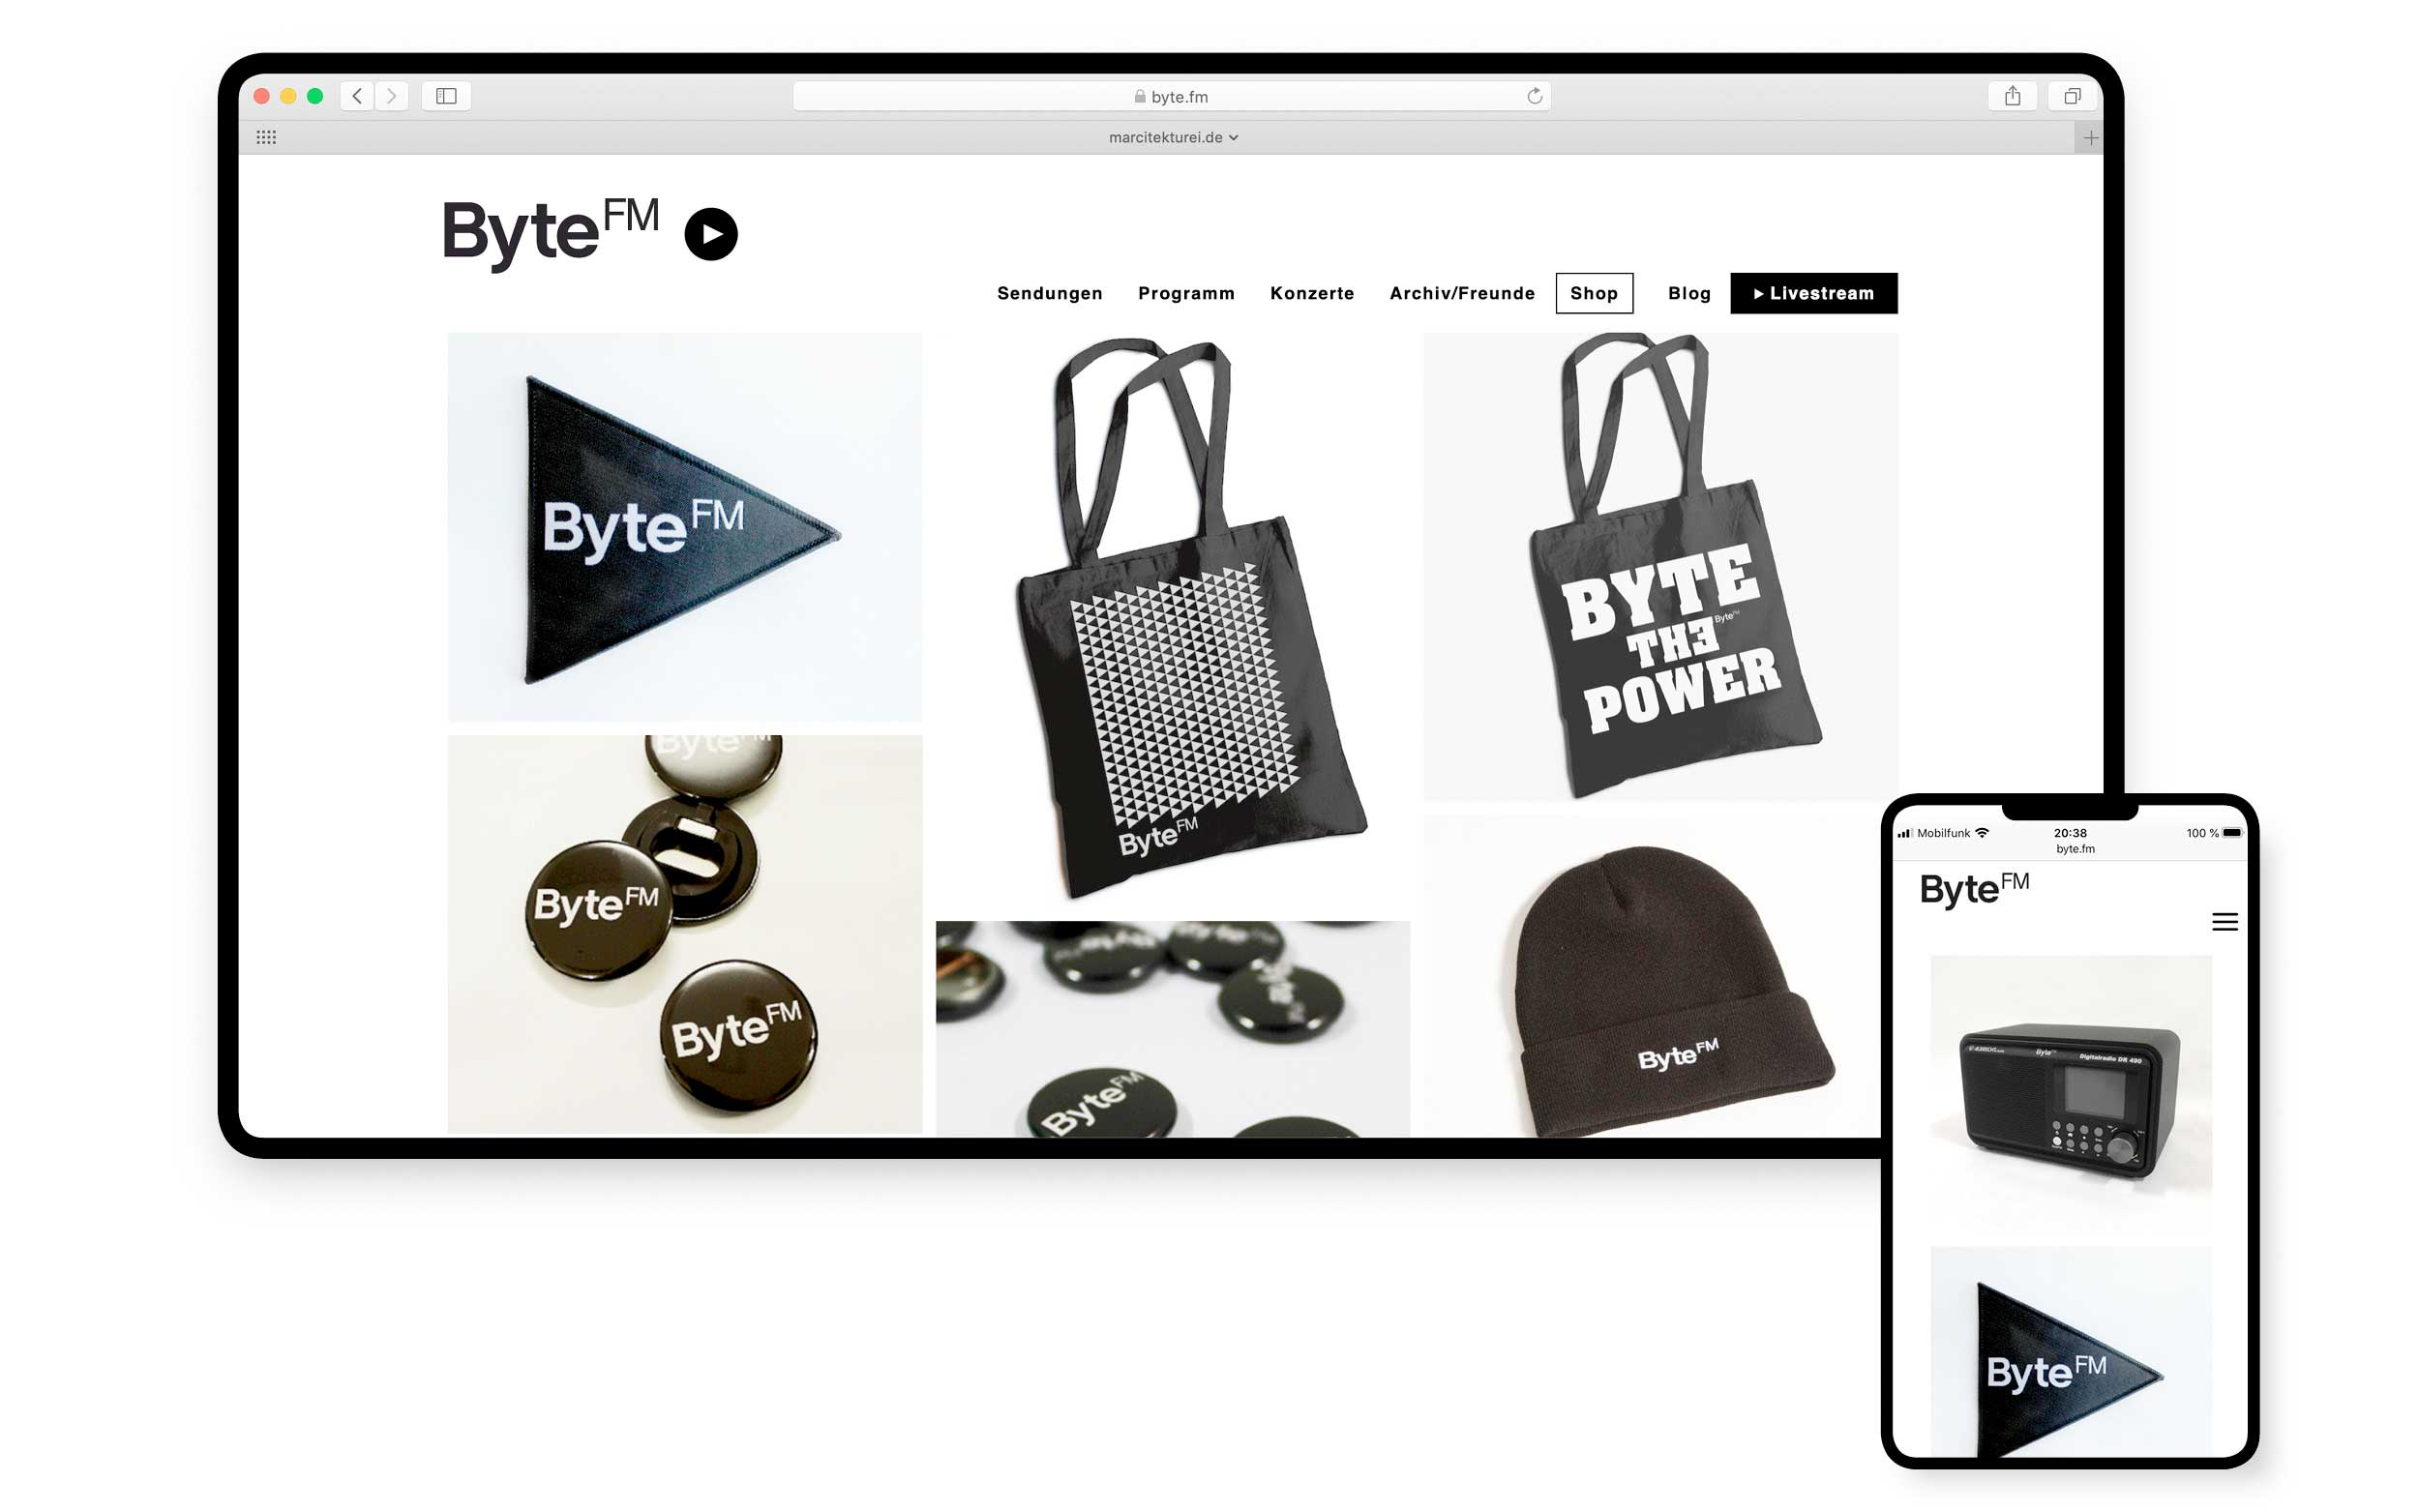 ByteFM Shop